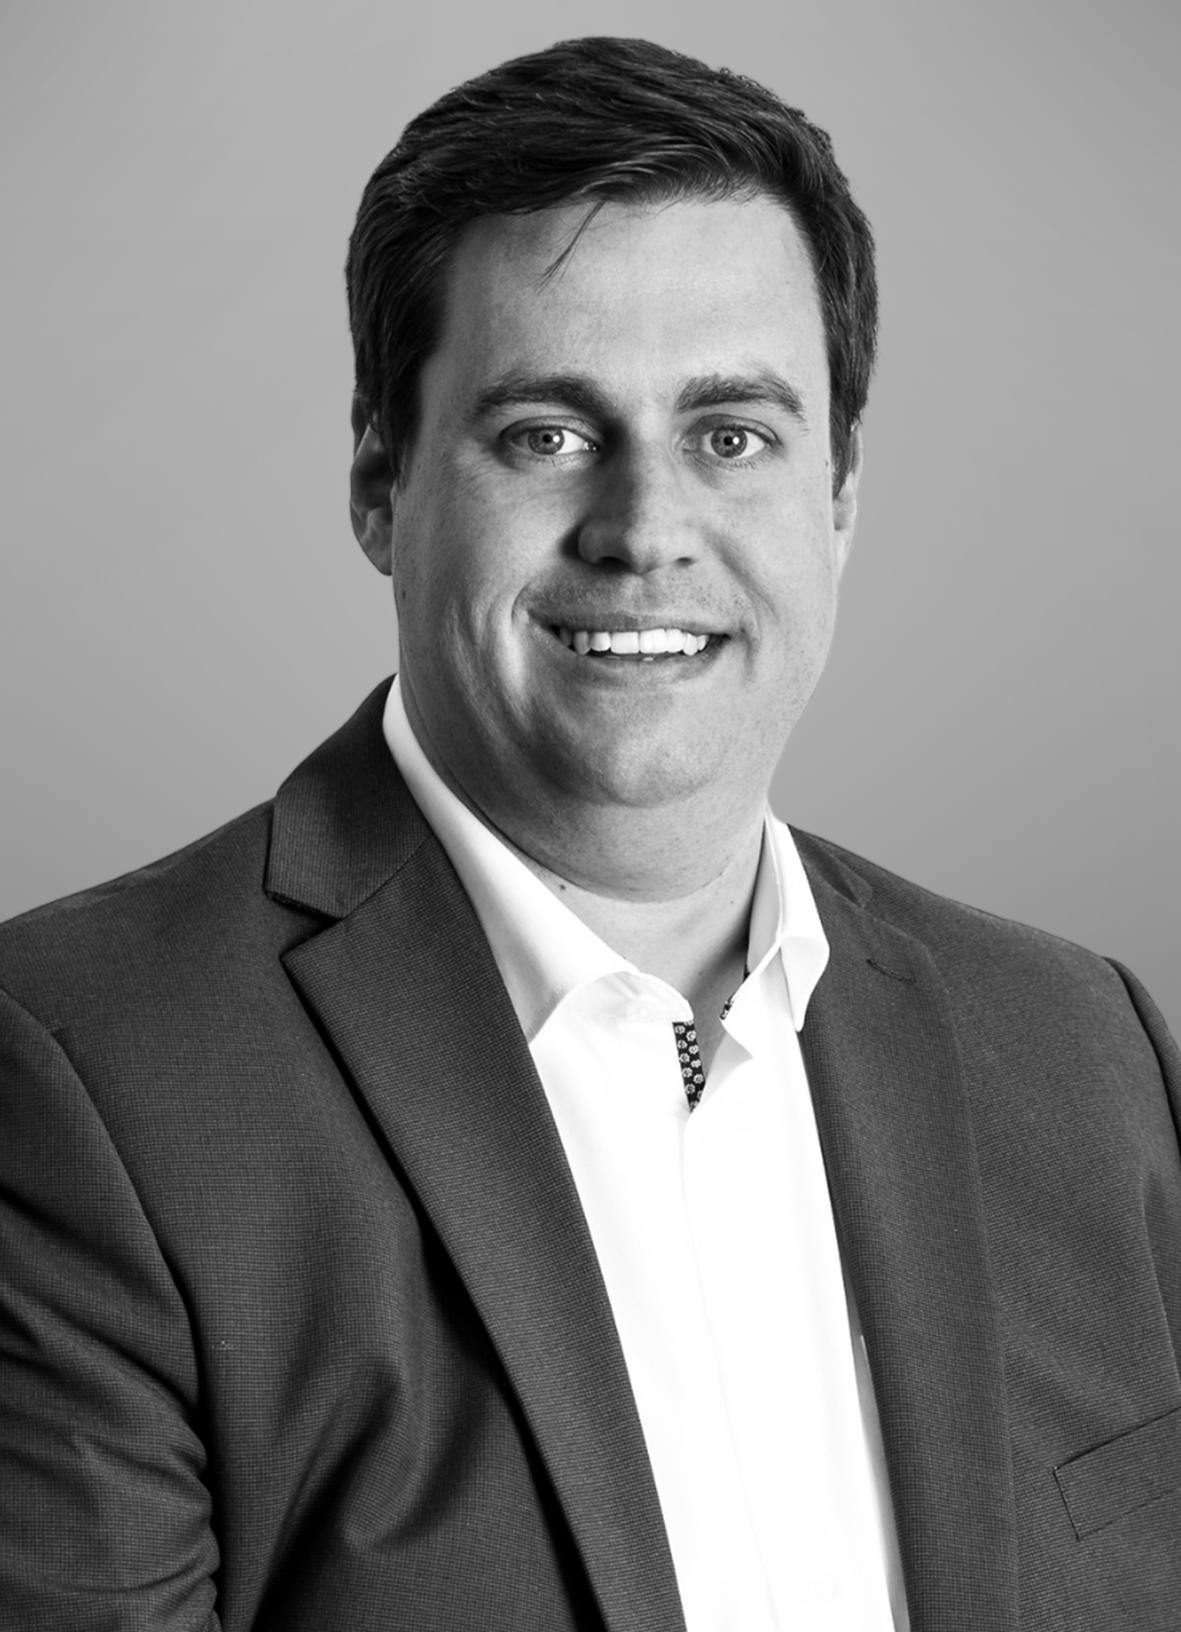 Michael Boortz